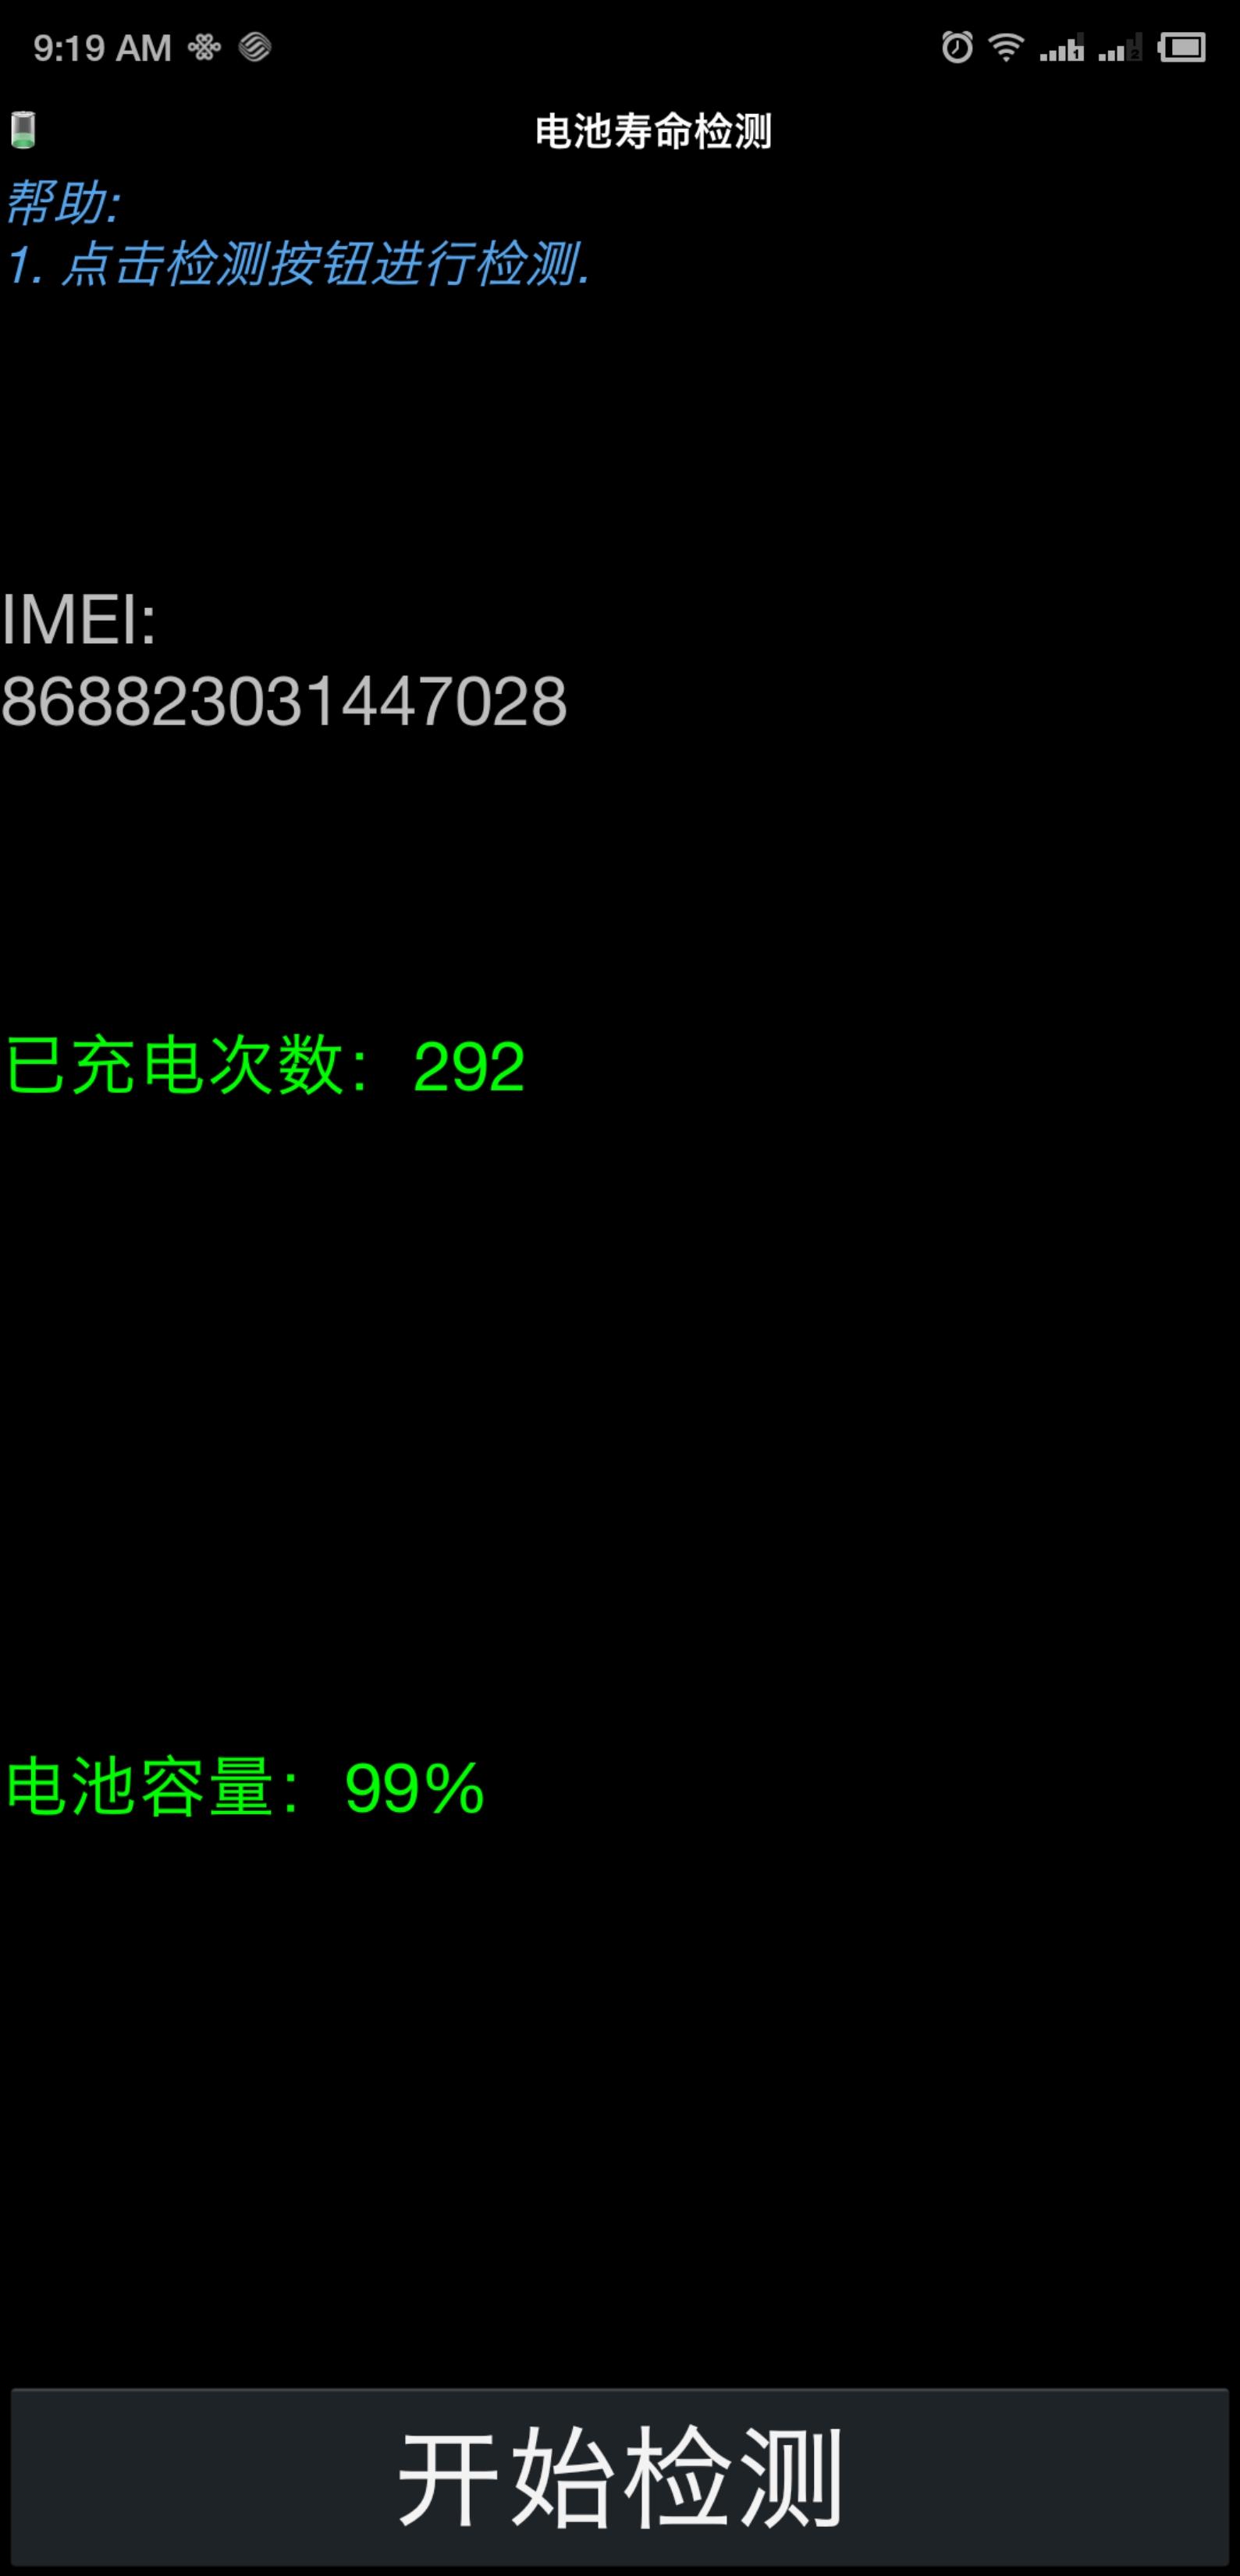 Screenshot_2019-08-18-09-19-13-661_??????.png